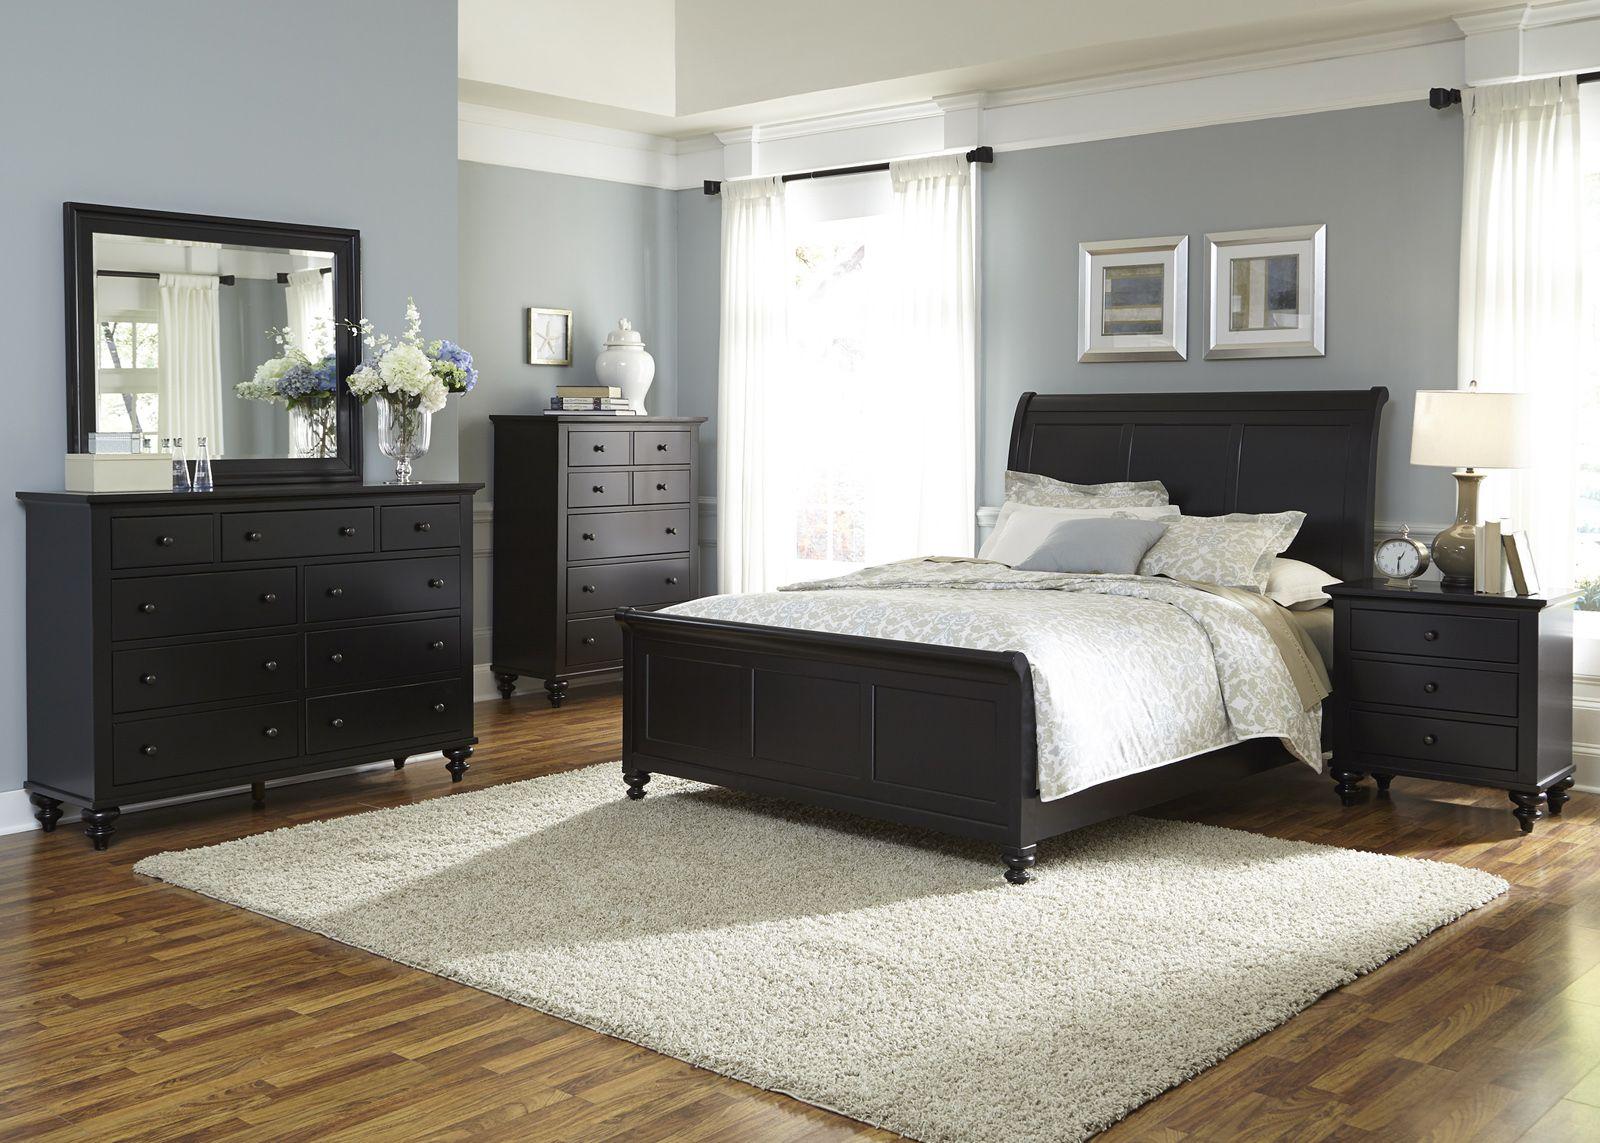 Liberty Furniture Hamilton III 11-Piece Sleigh Bedroom Set in